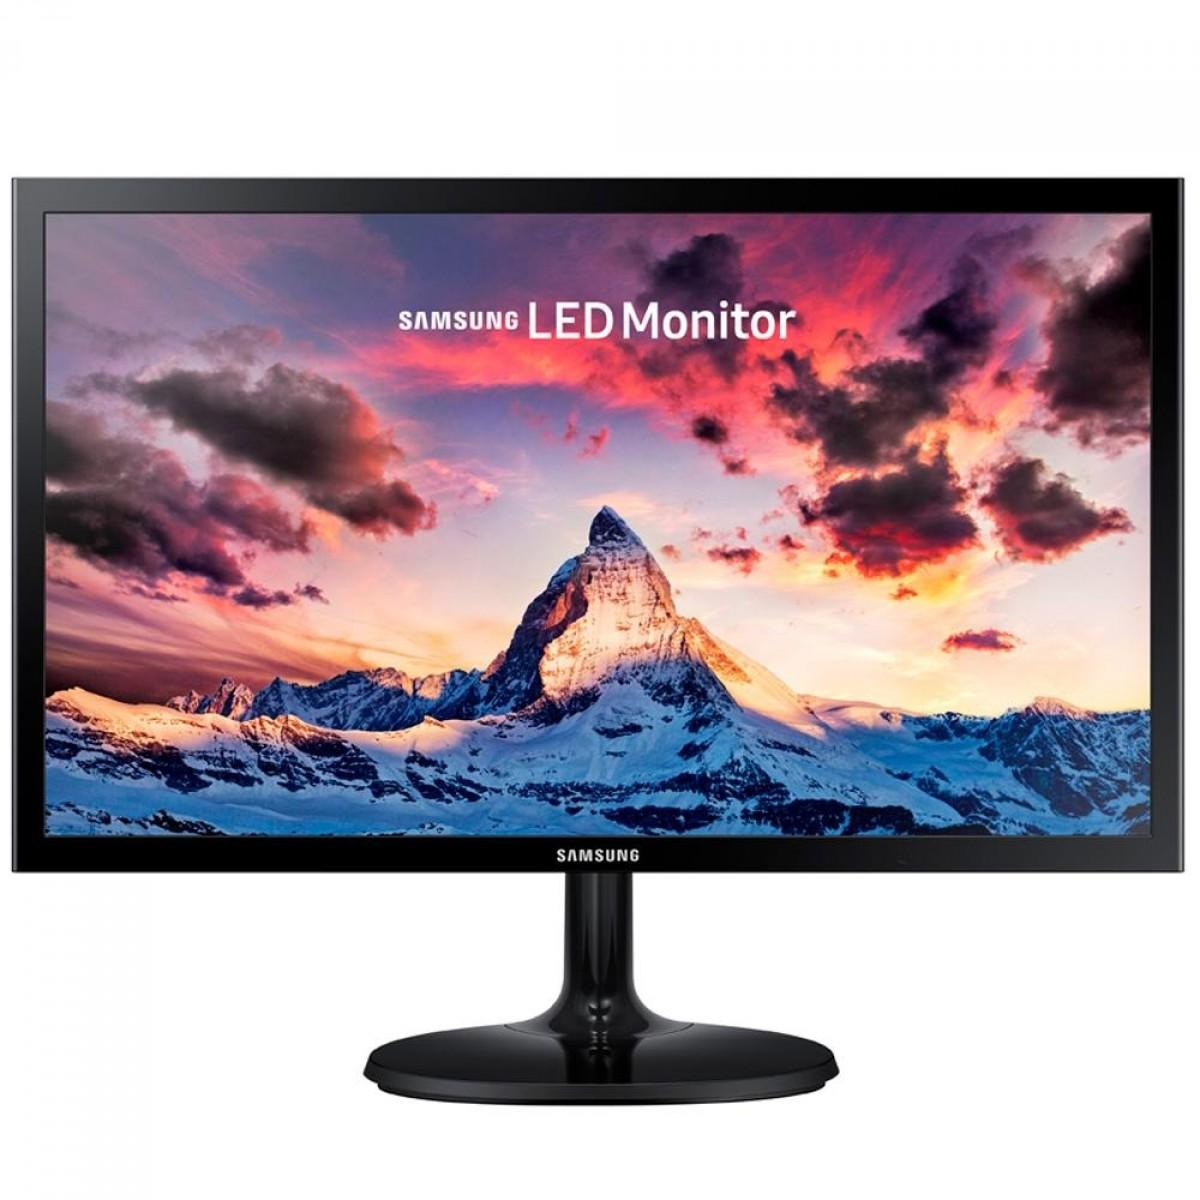 Monitor Gamer Samsung Led, 21,5 Pol, HDMI, Full-HD, LS22F350FHLMZD